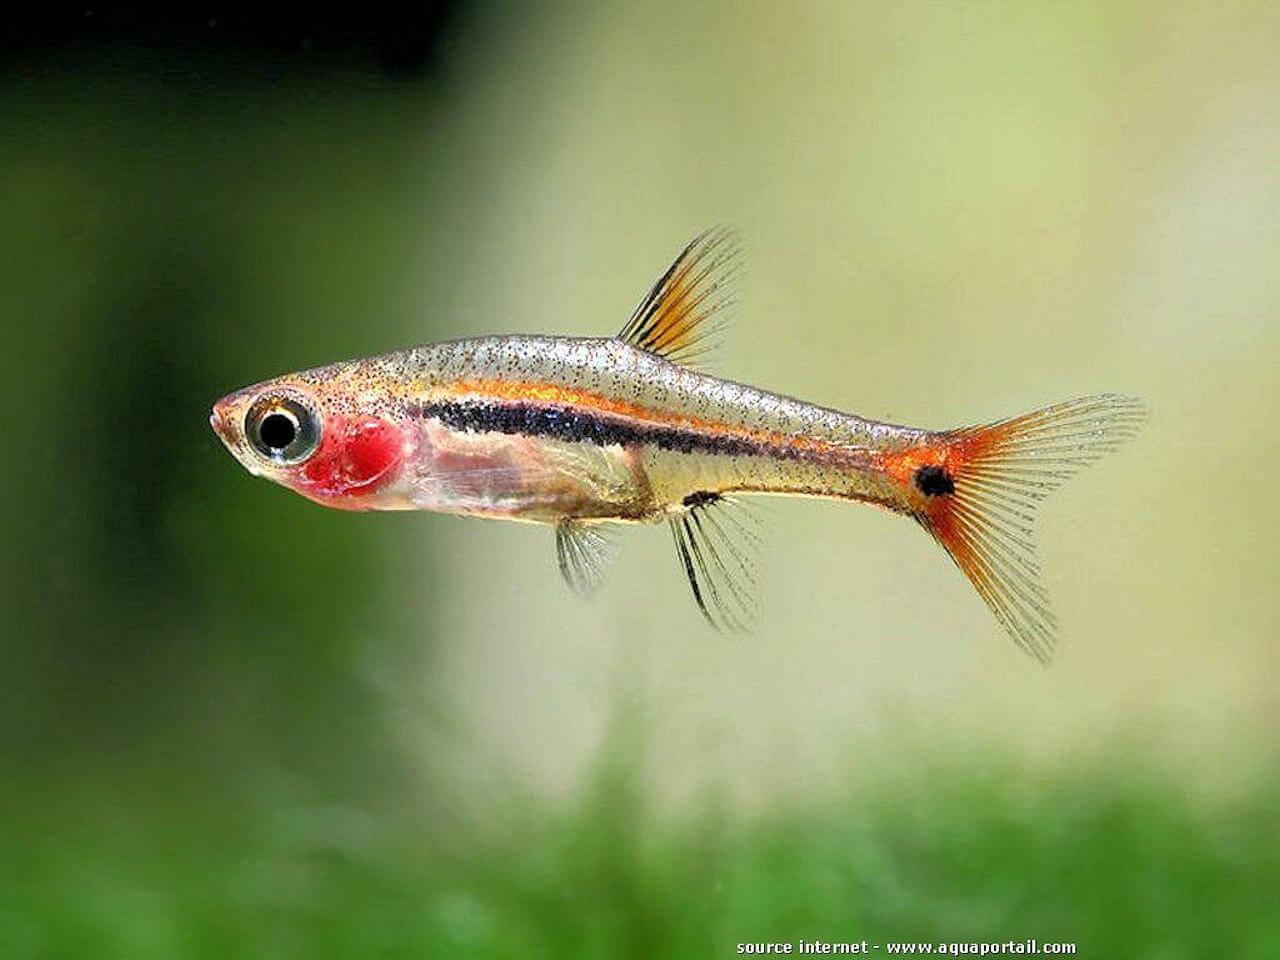 Besoin d'aide pour identifier mes poissons ! Boraras-urophthalmoides